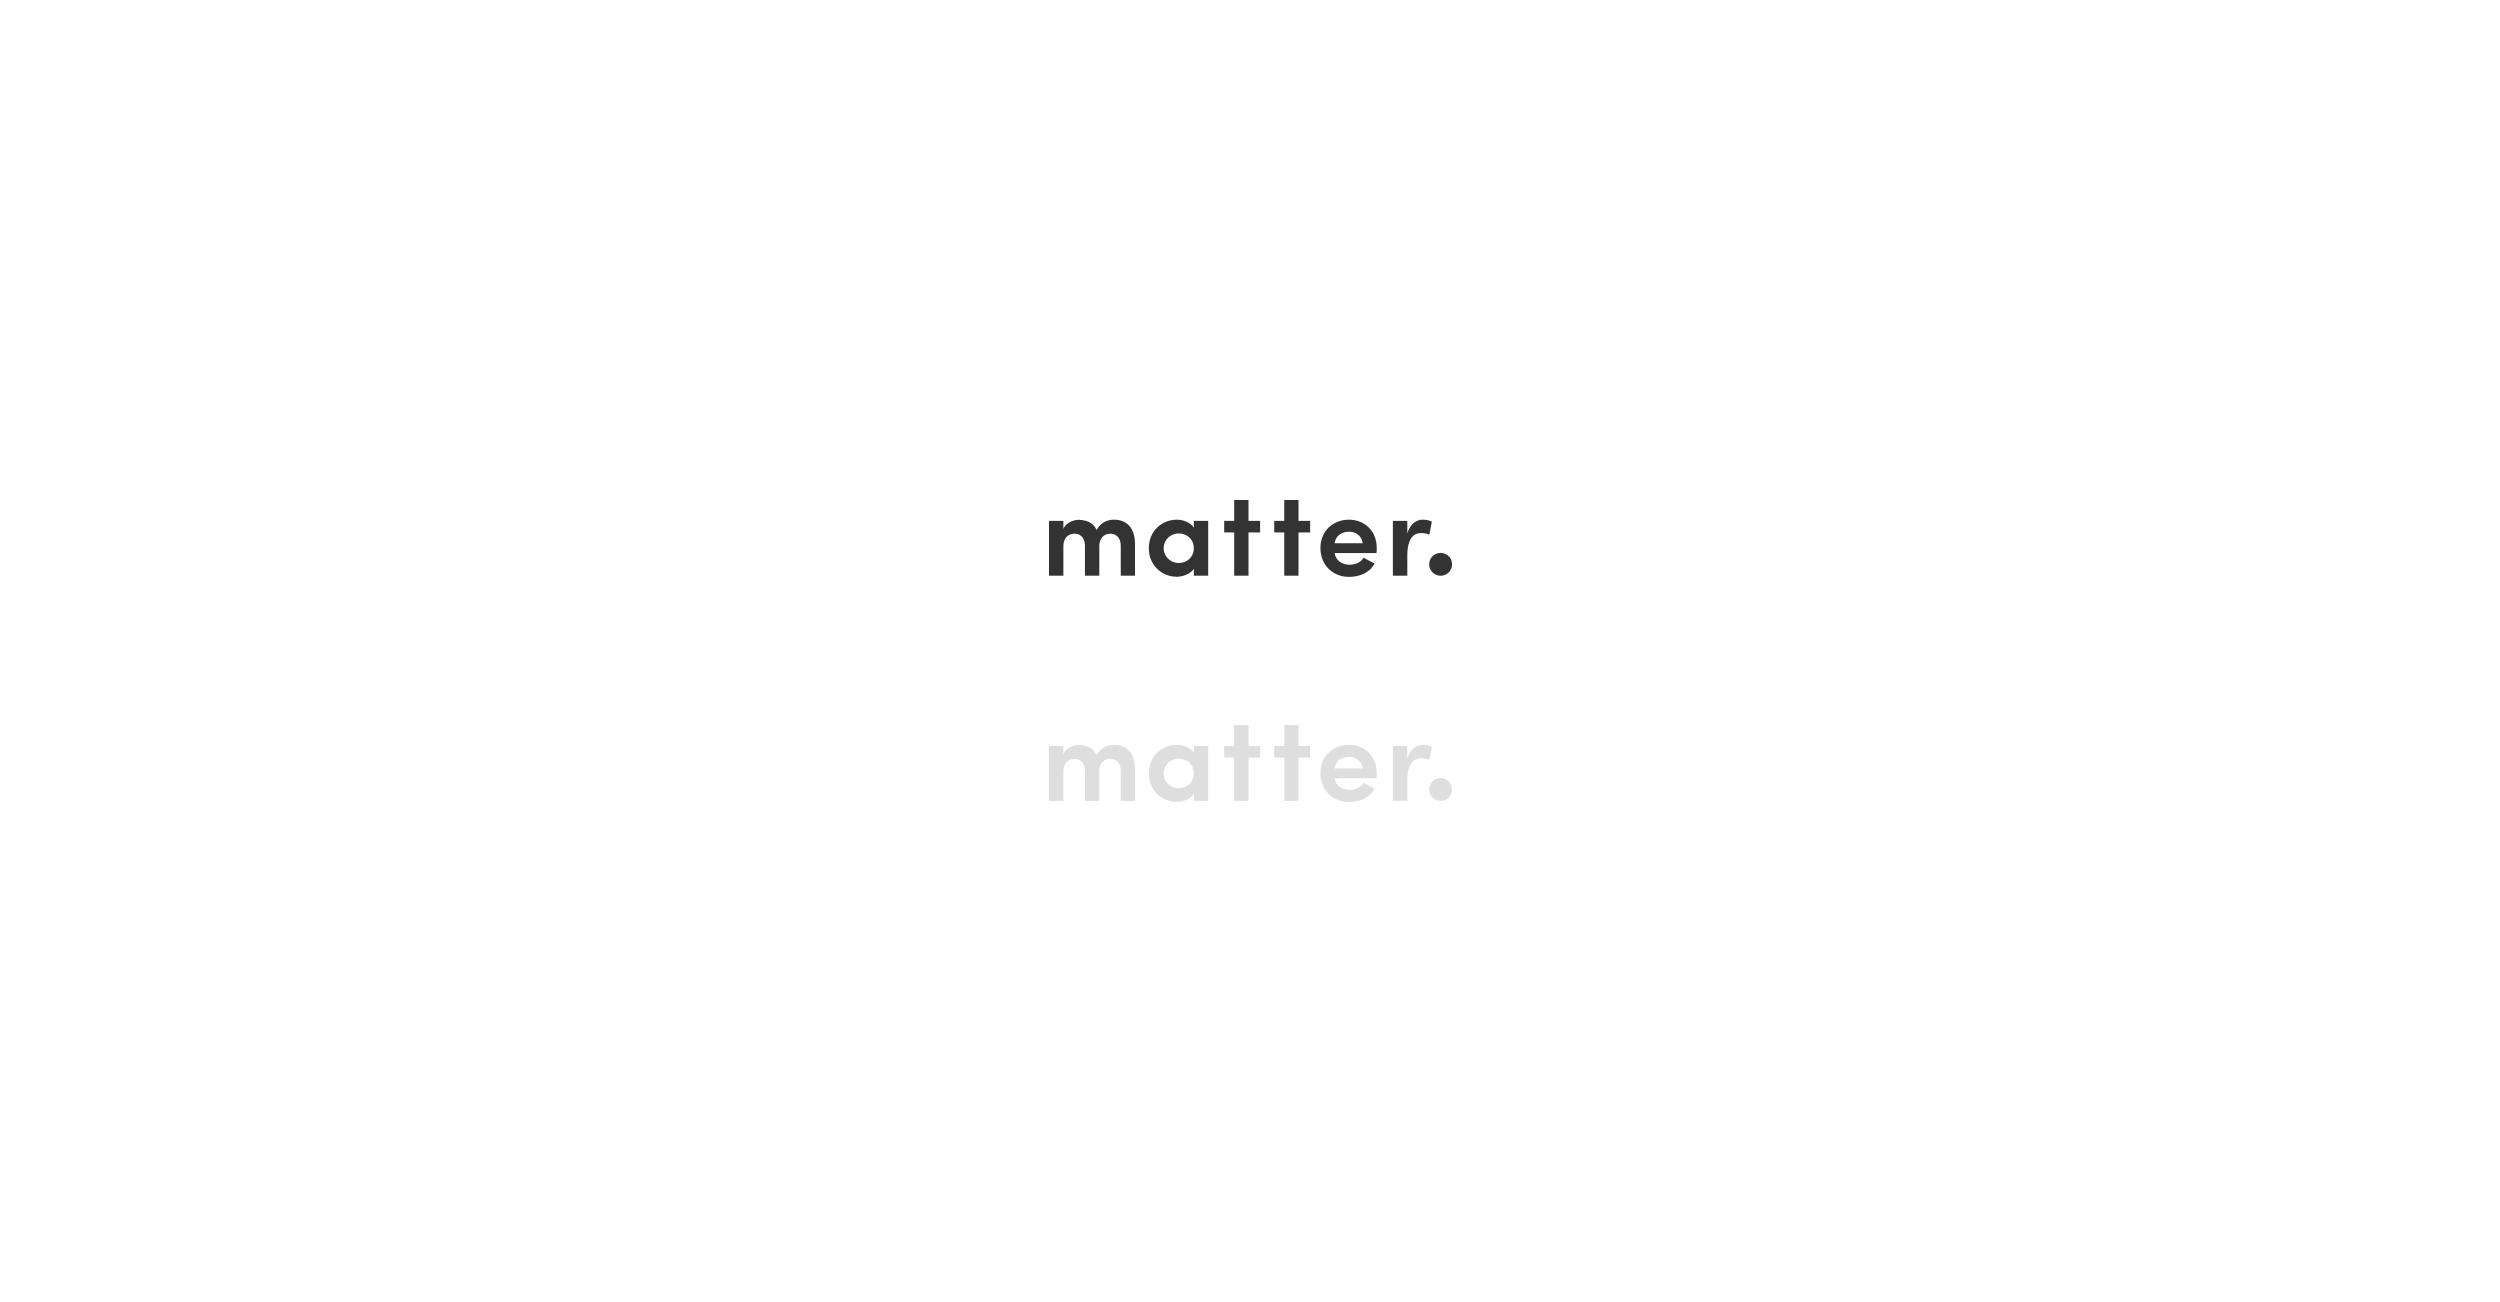 matter-logo-2up.png